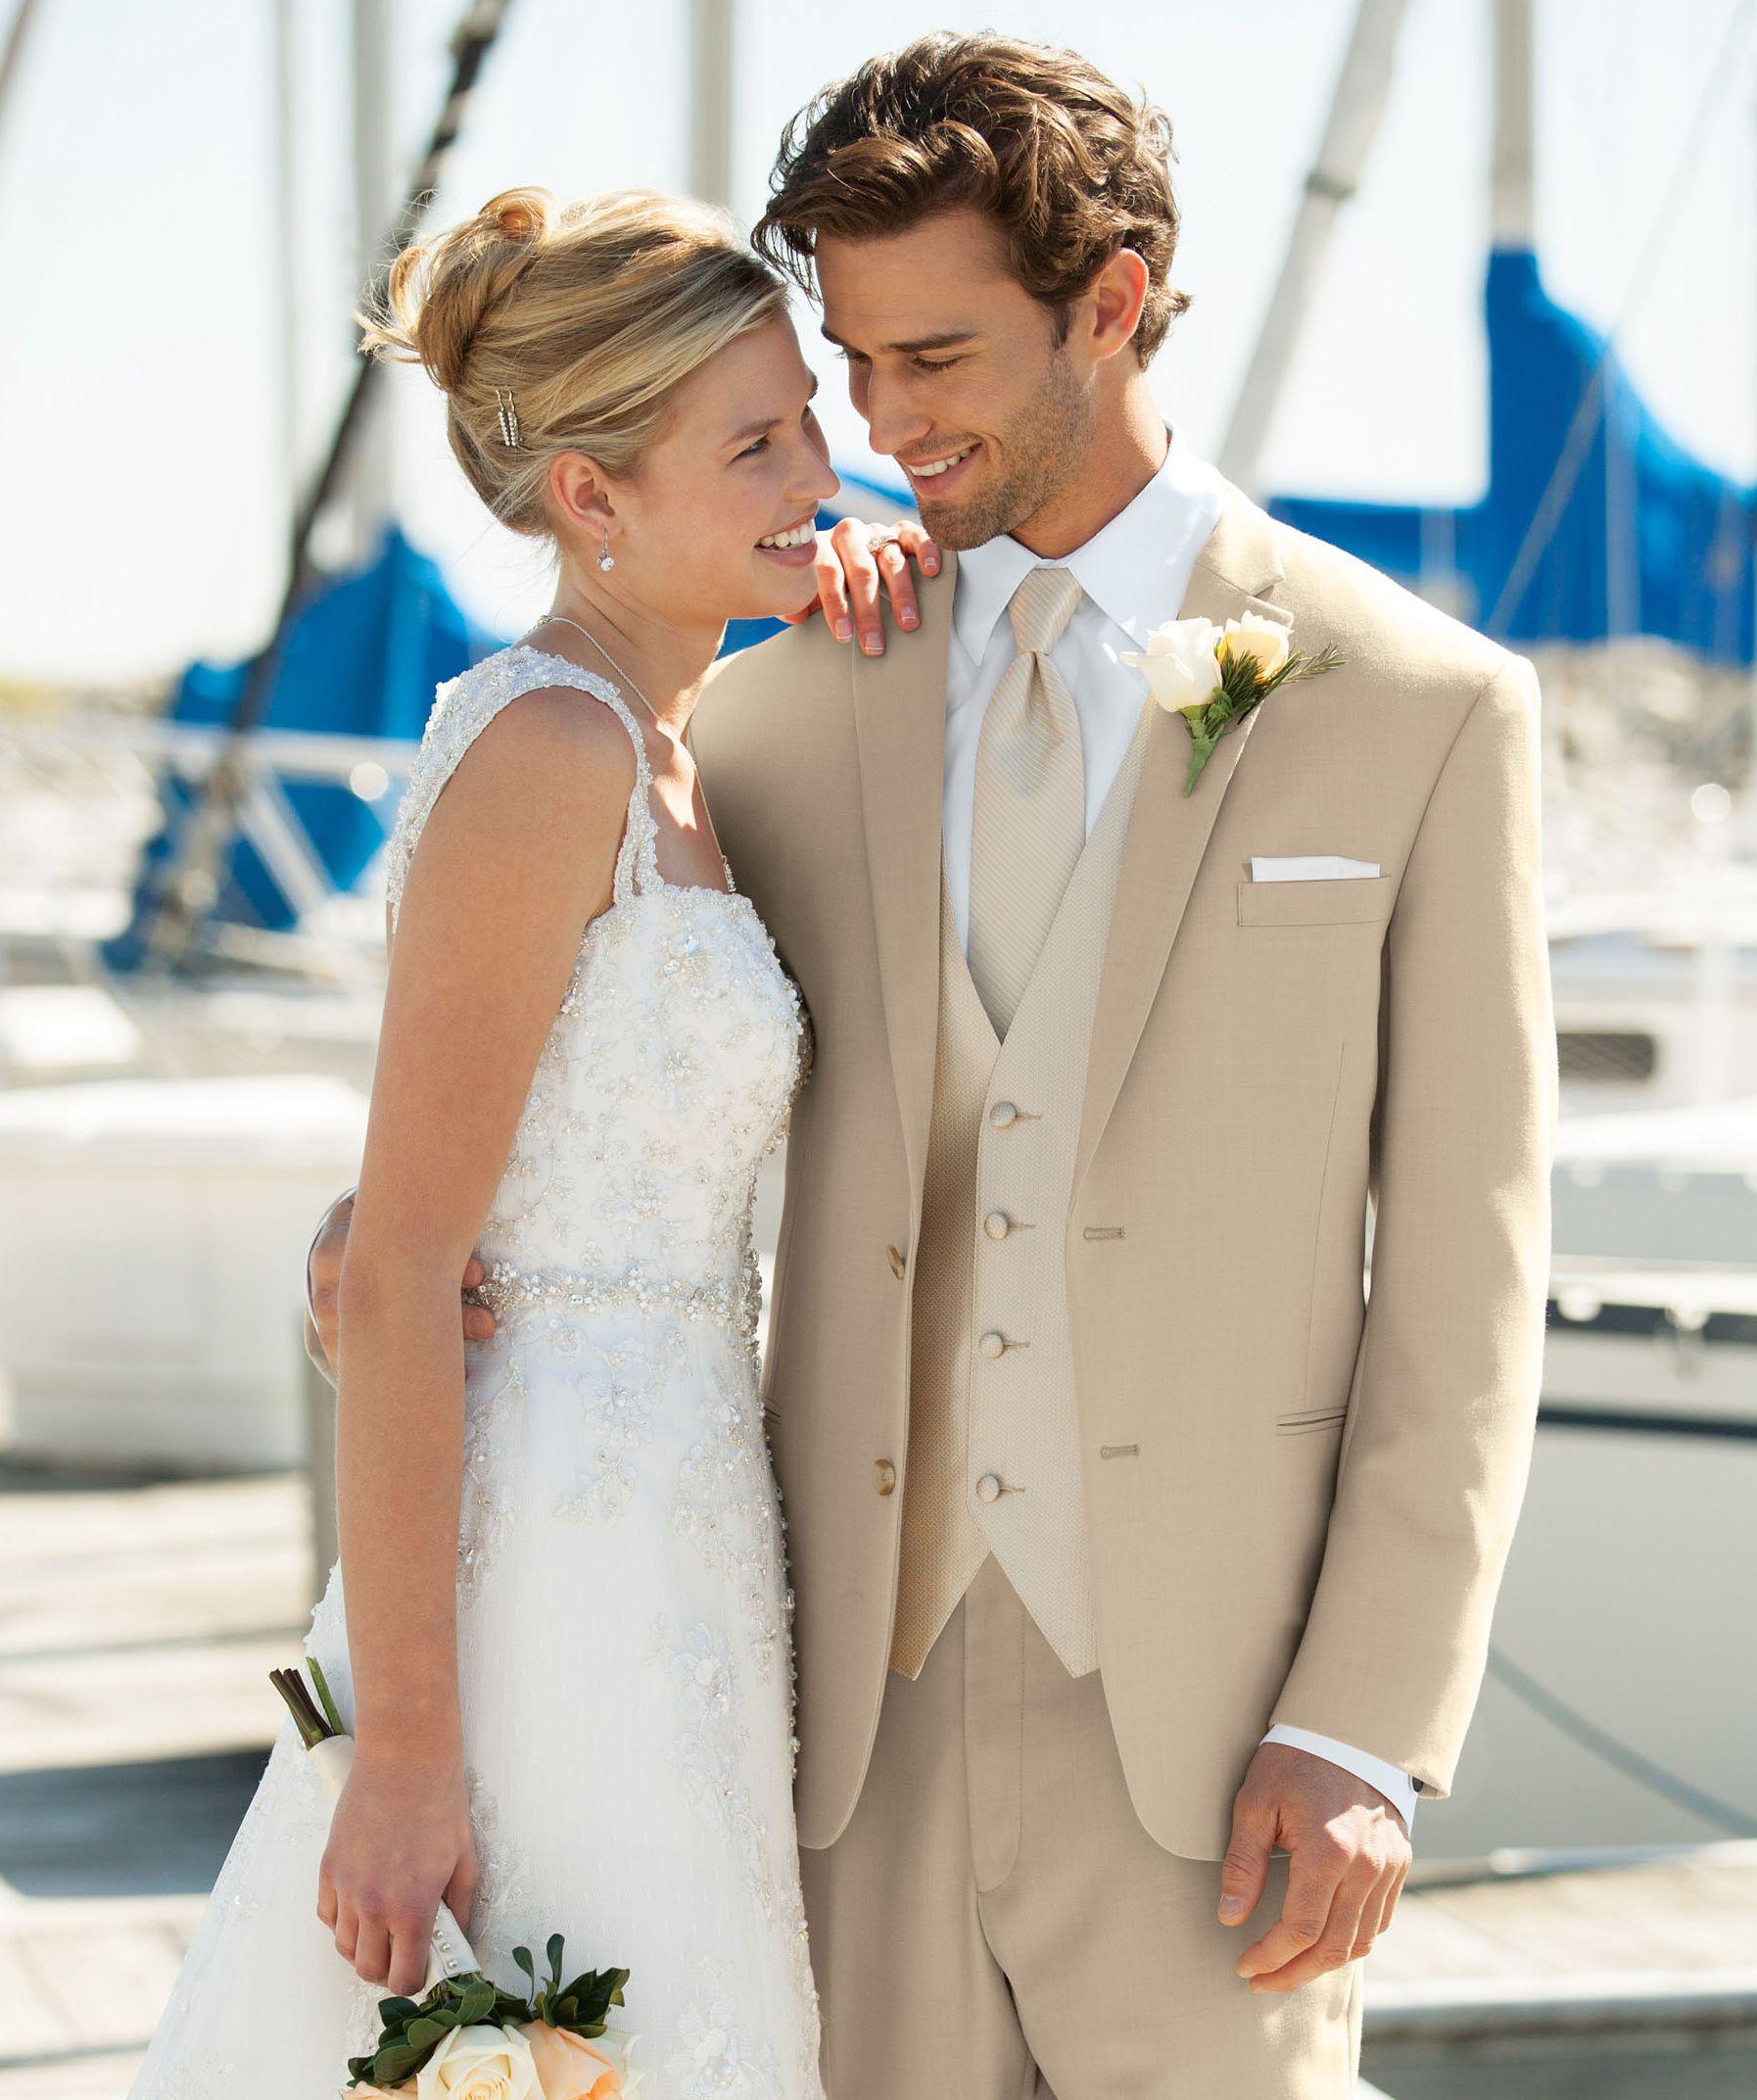 Havana Destination Wedding Suit | Menswear and Tuxedos | Pinterest ...